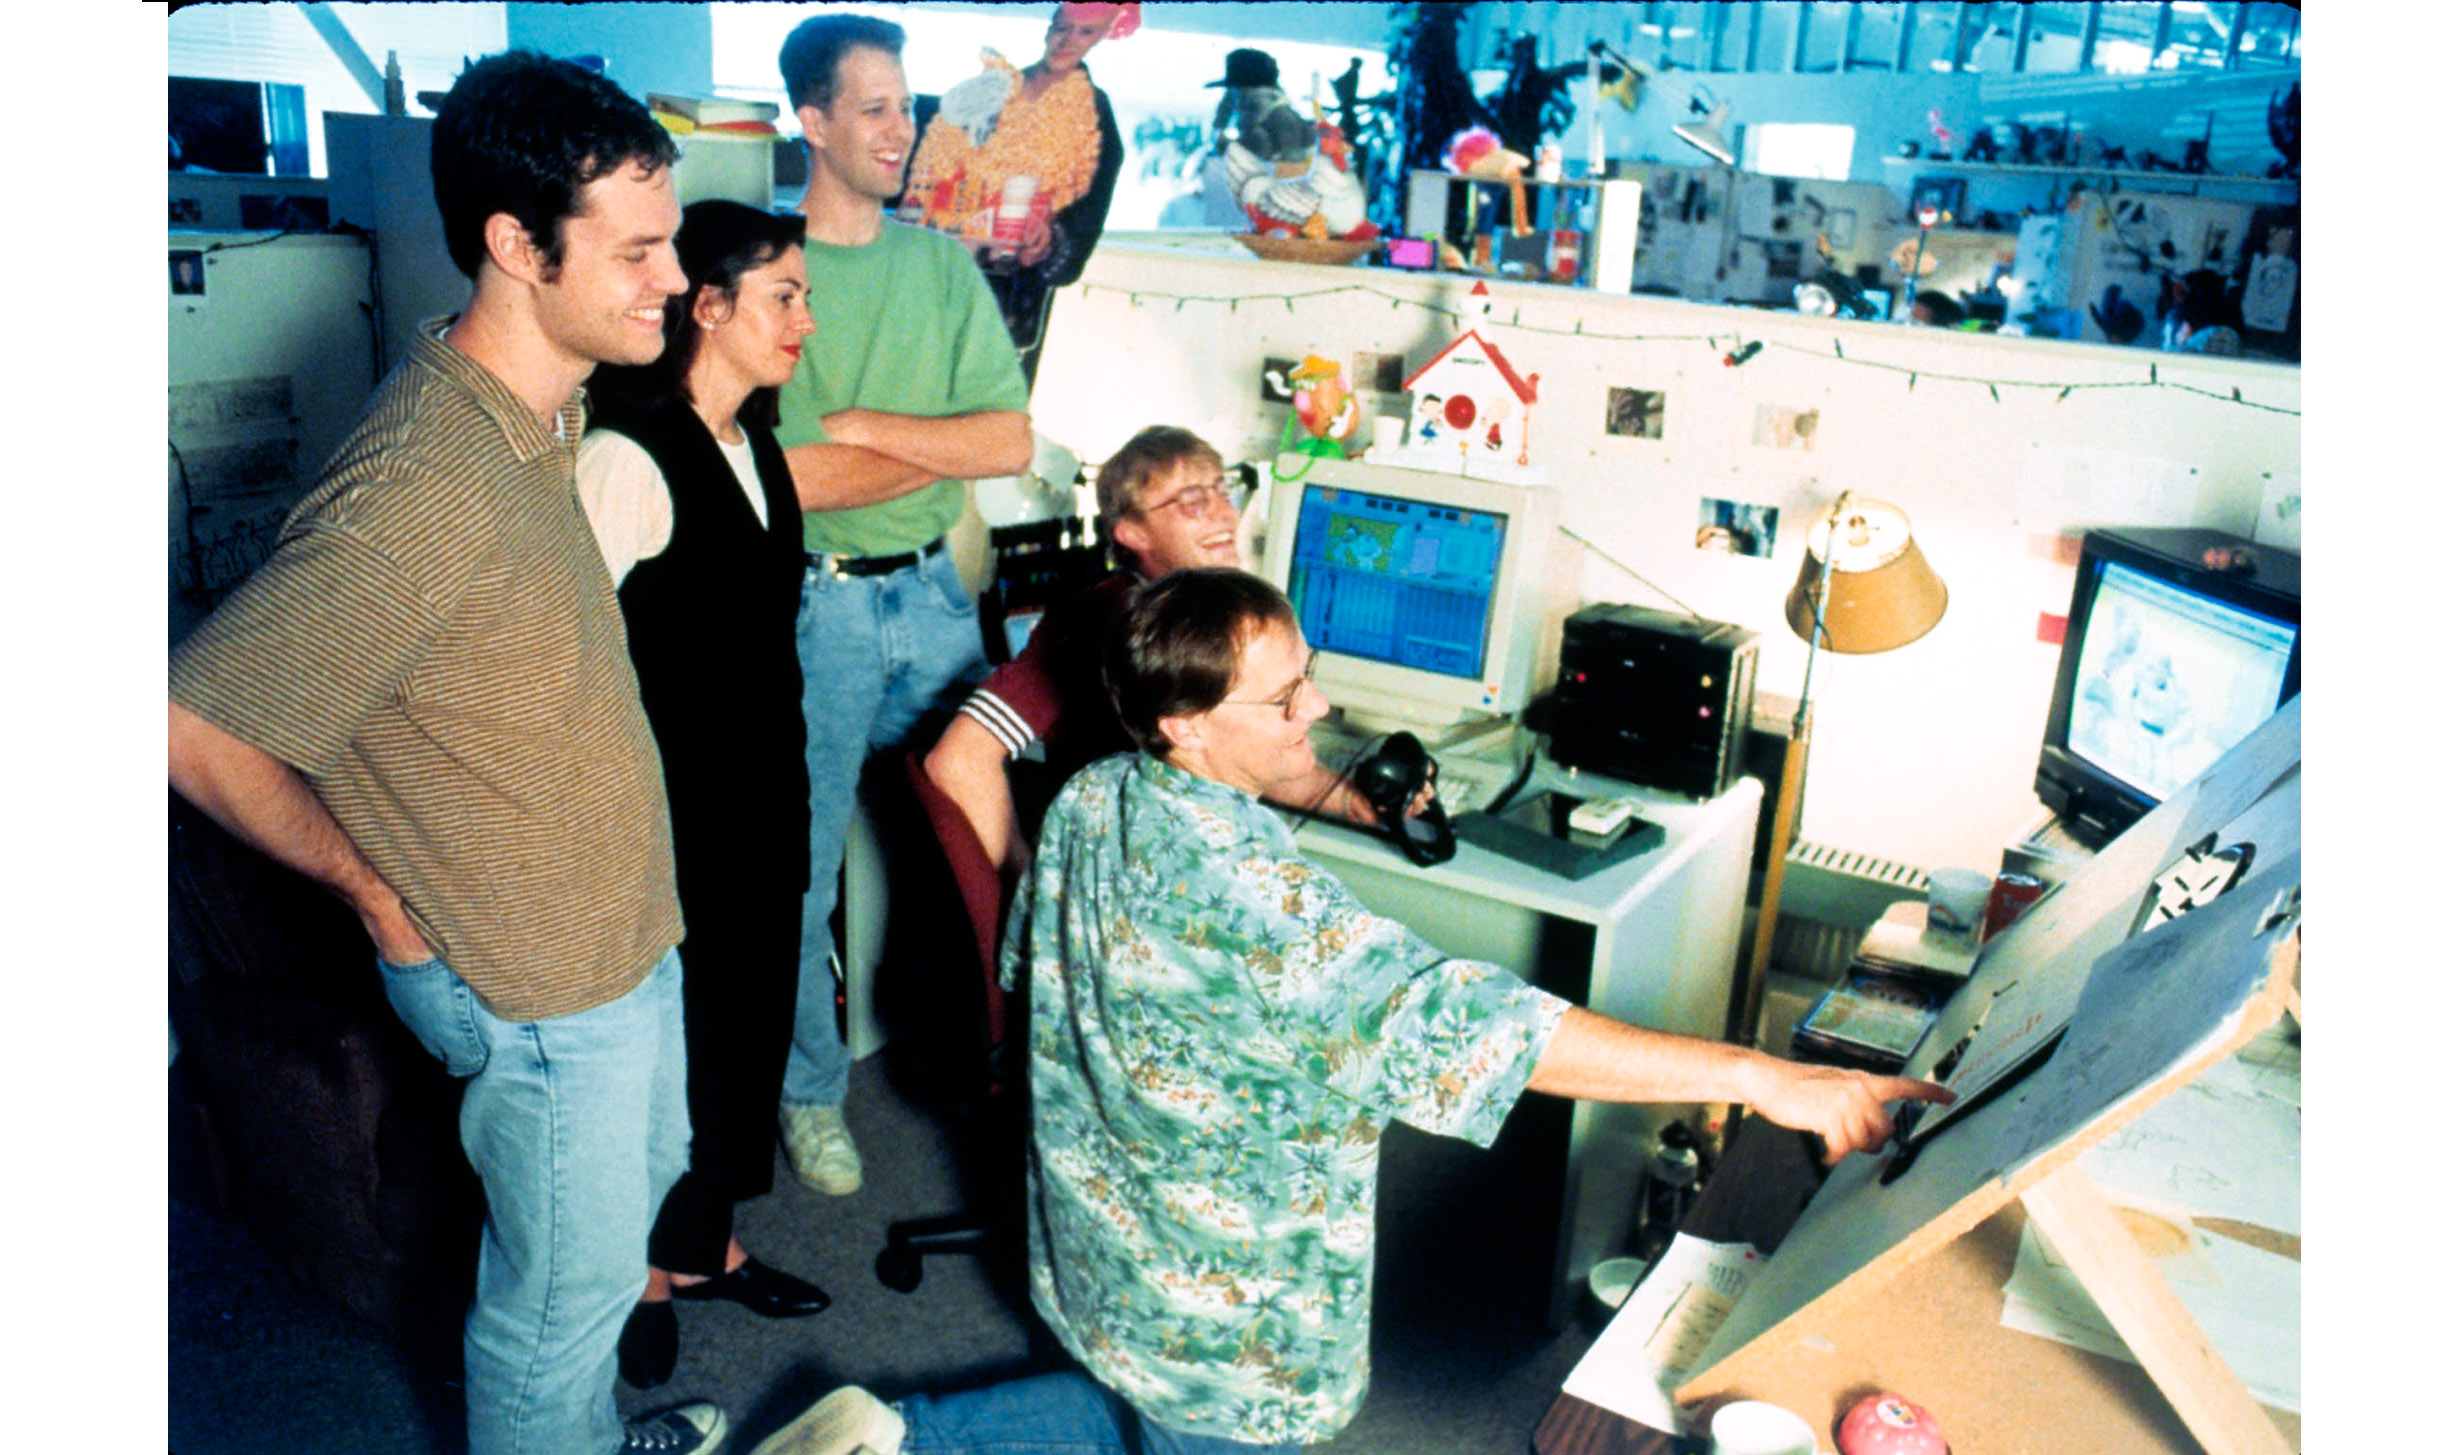 The Pixar crew working on 'Toy Story' with Lasseter, kneeling, in 1995.